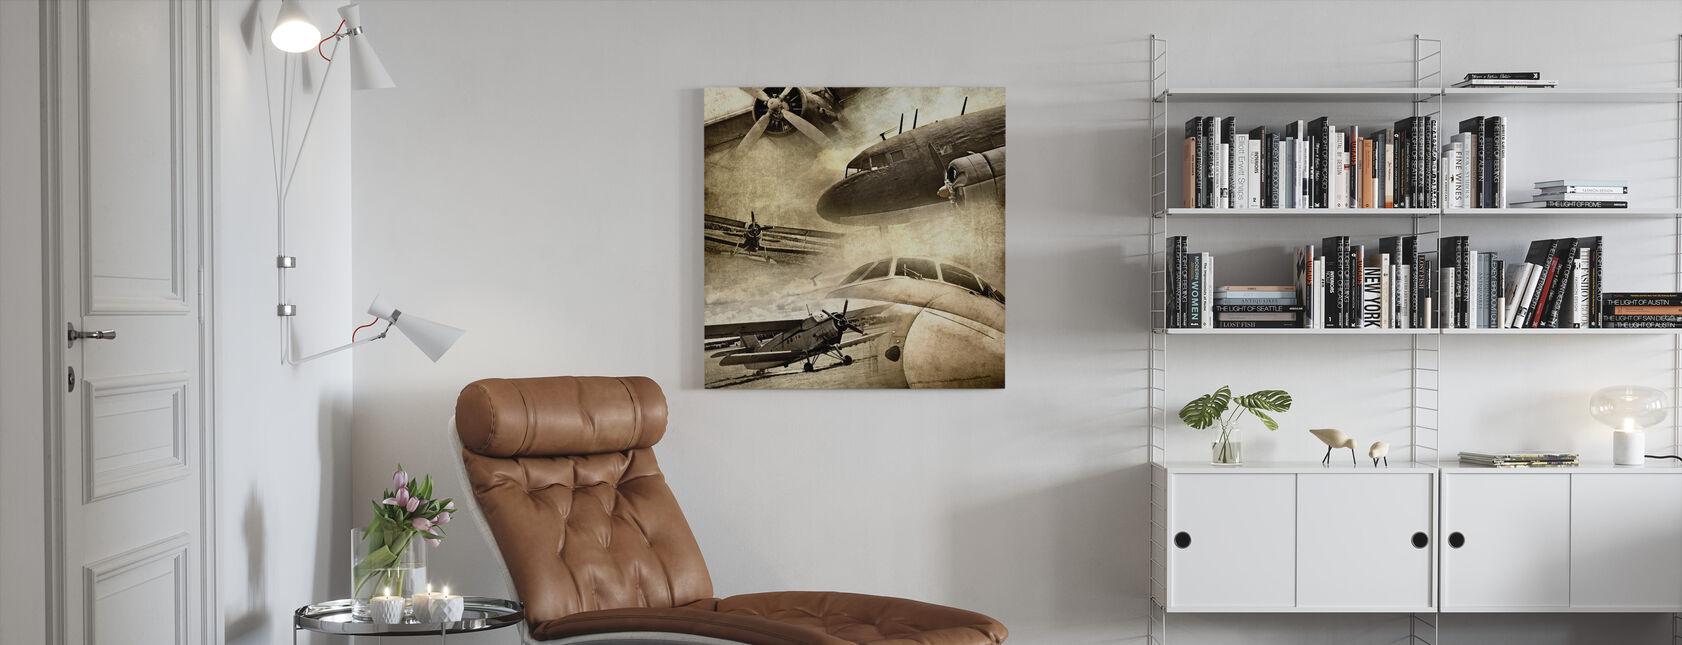 Retro Flugzeuge - Leinwandbild - Wohnzimmer